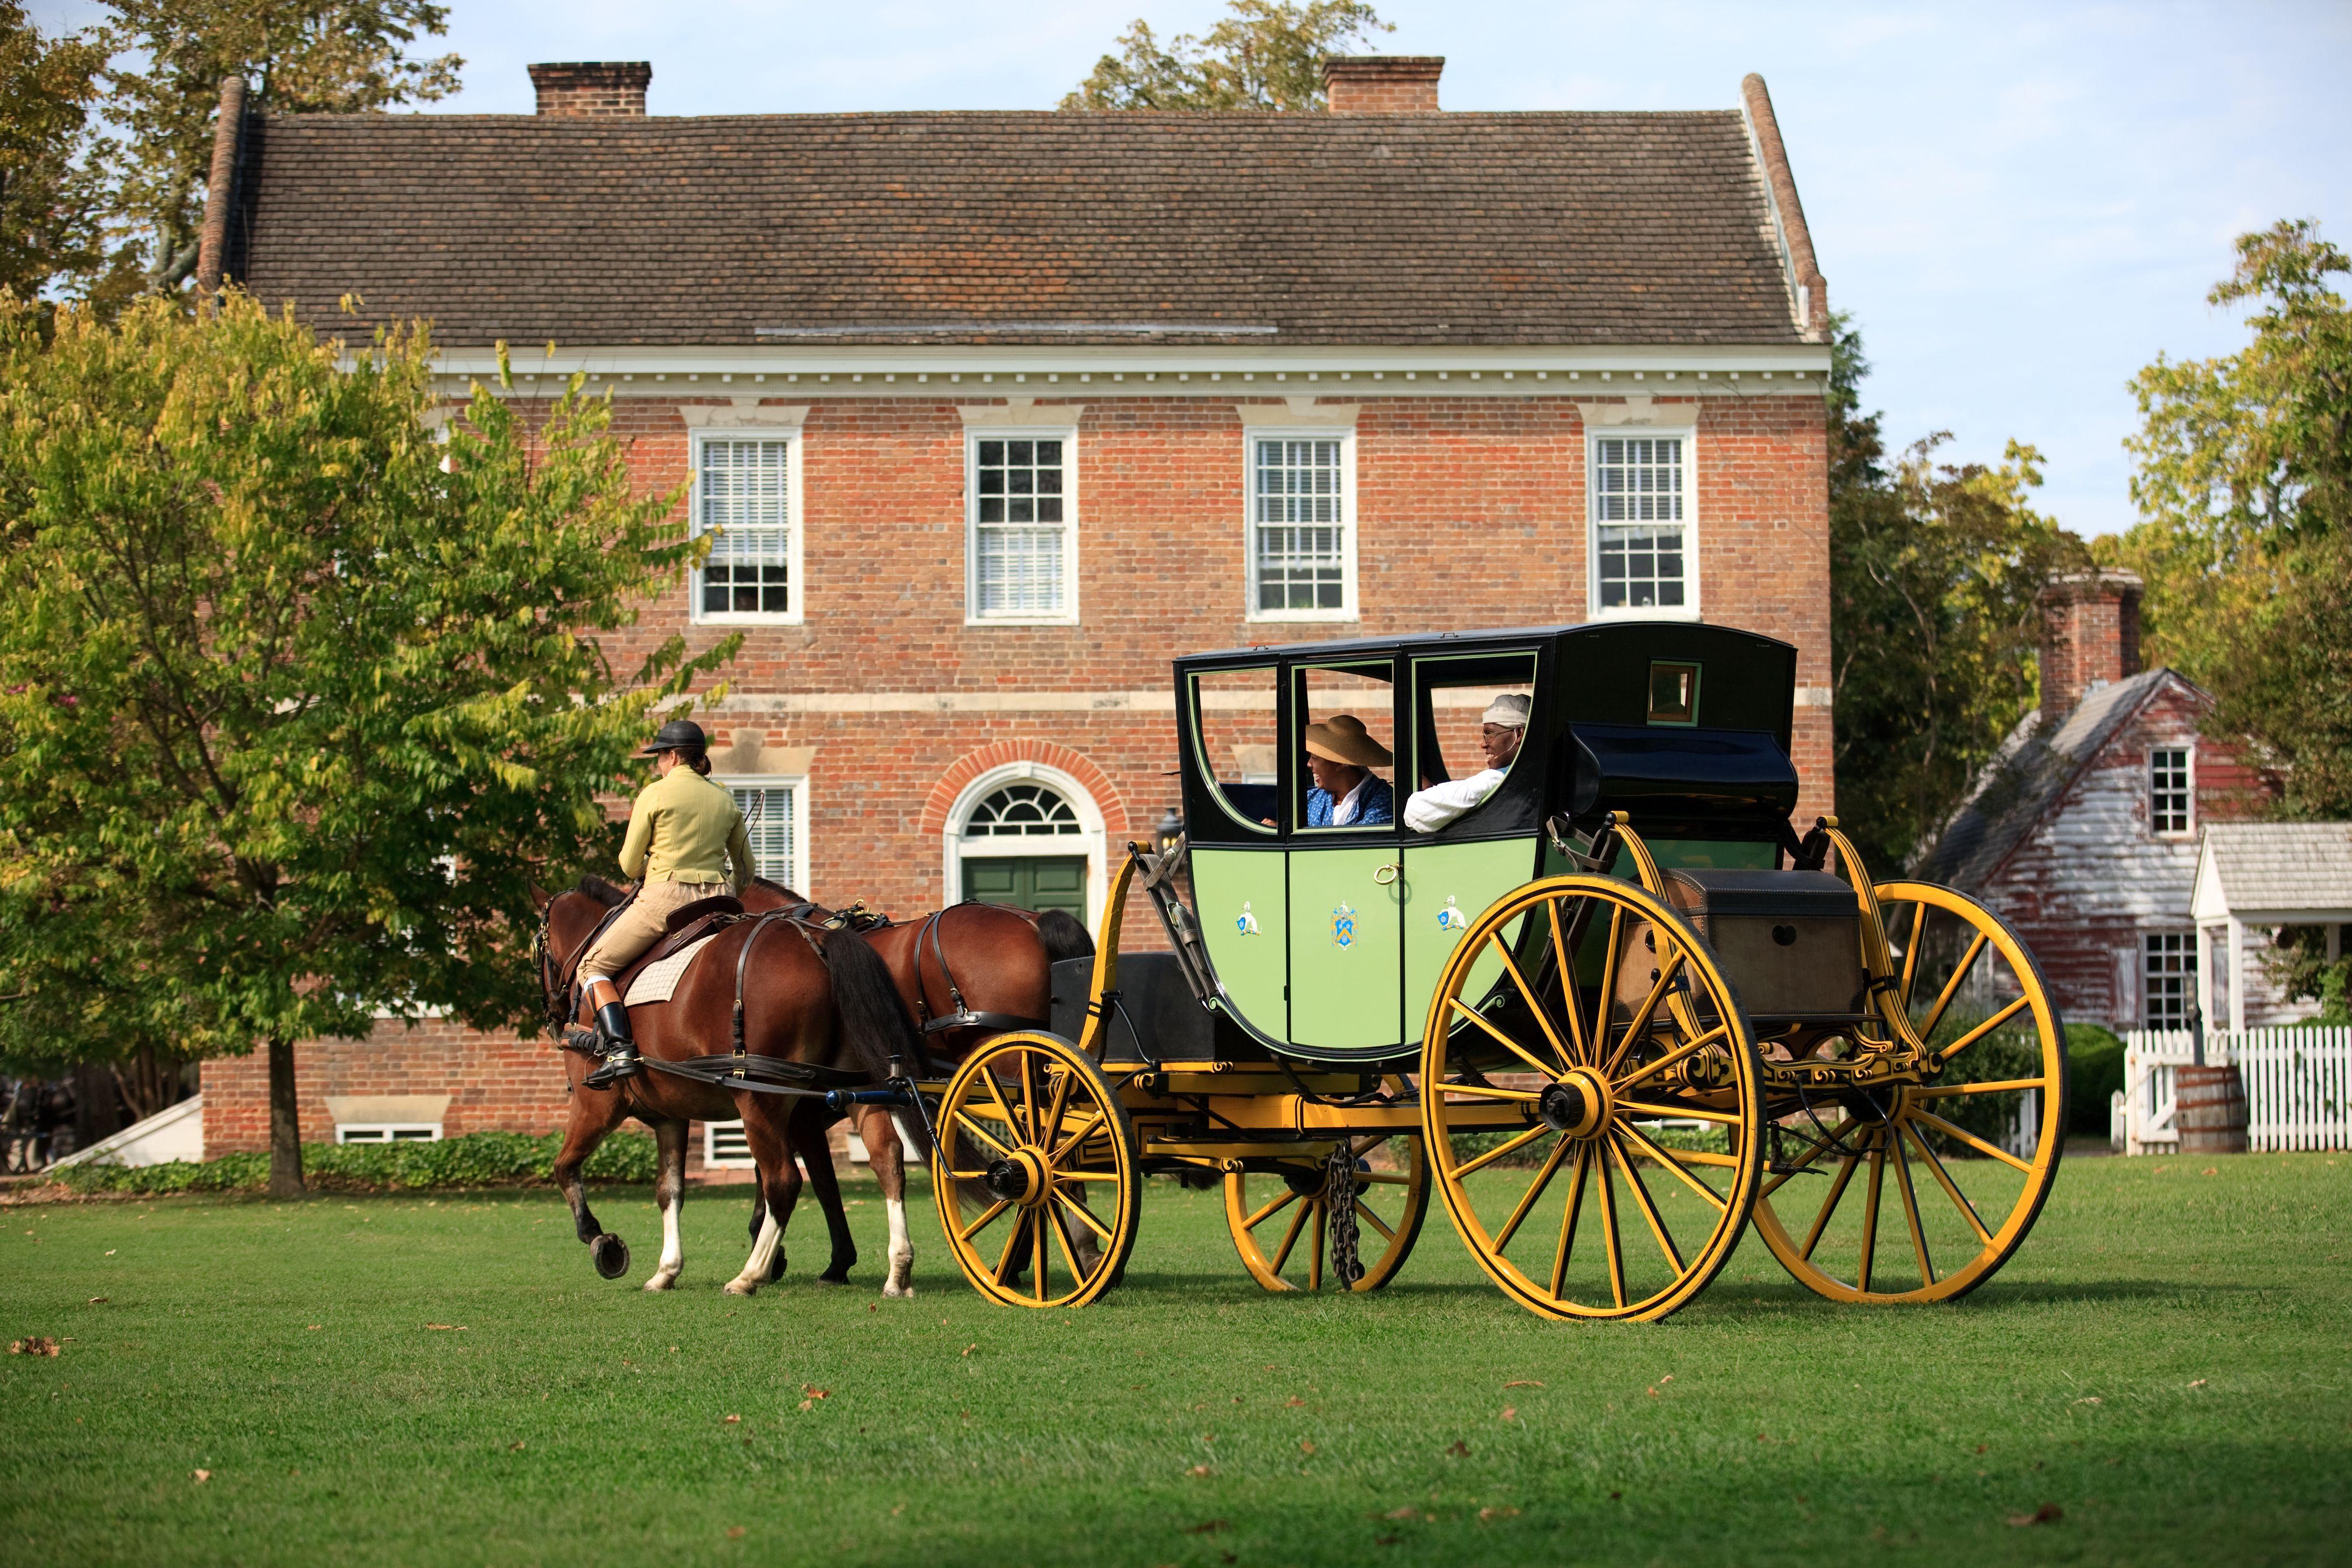 Colonial era horse drawn carriage